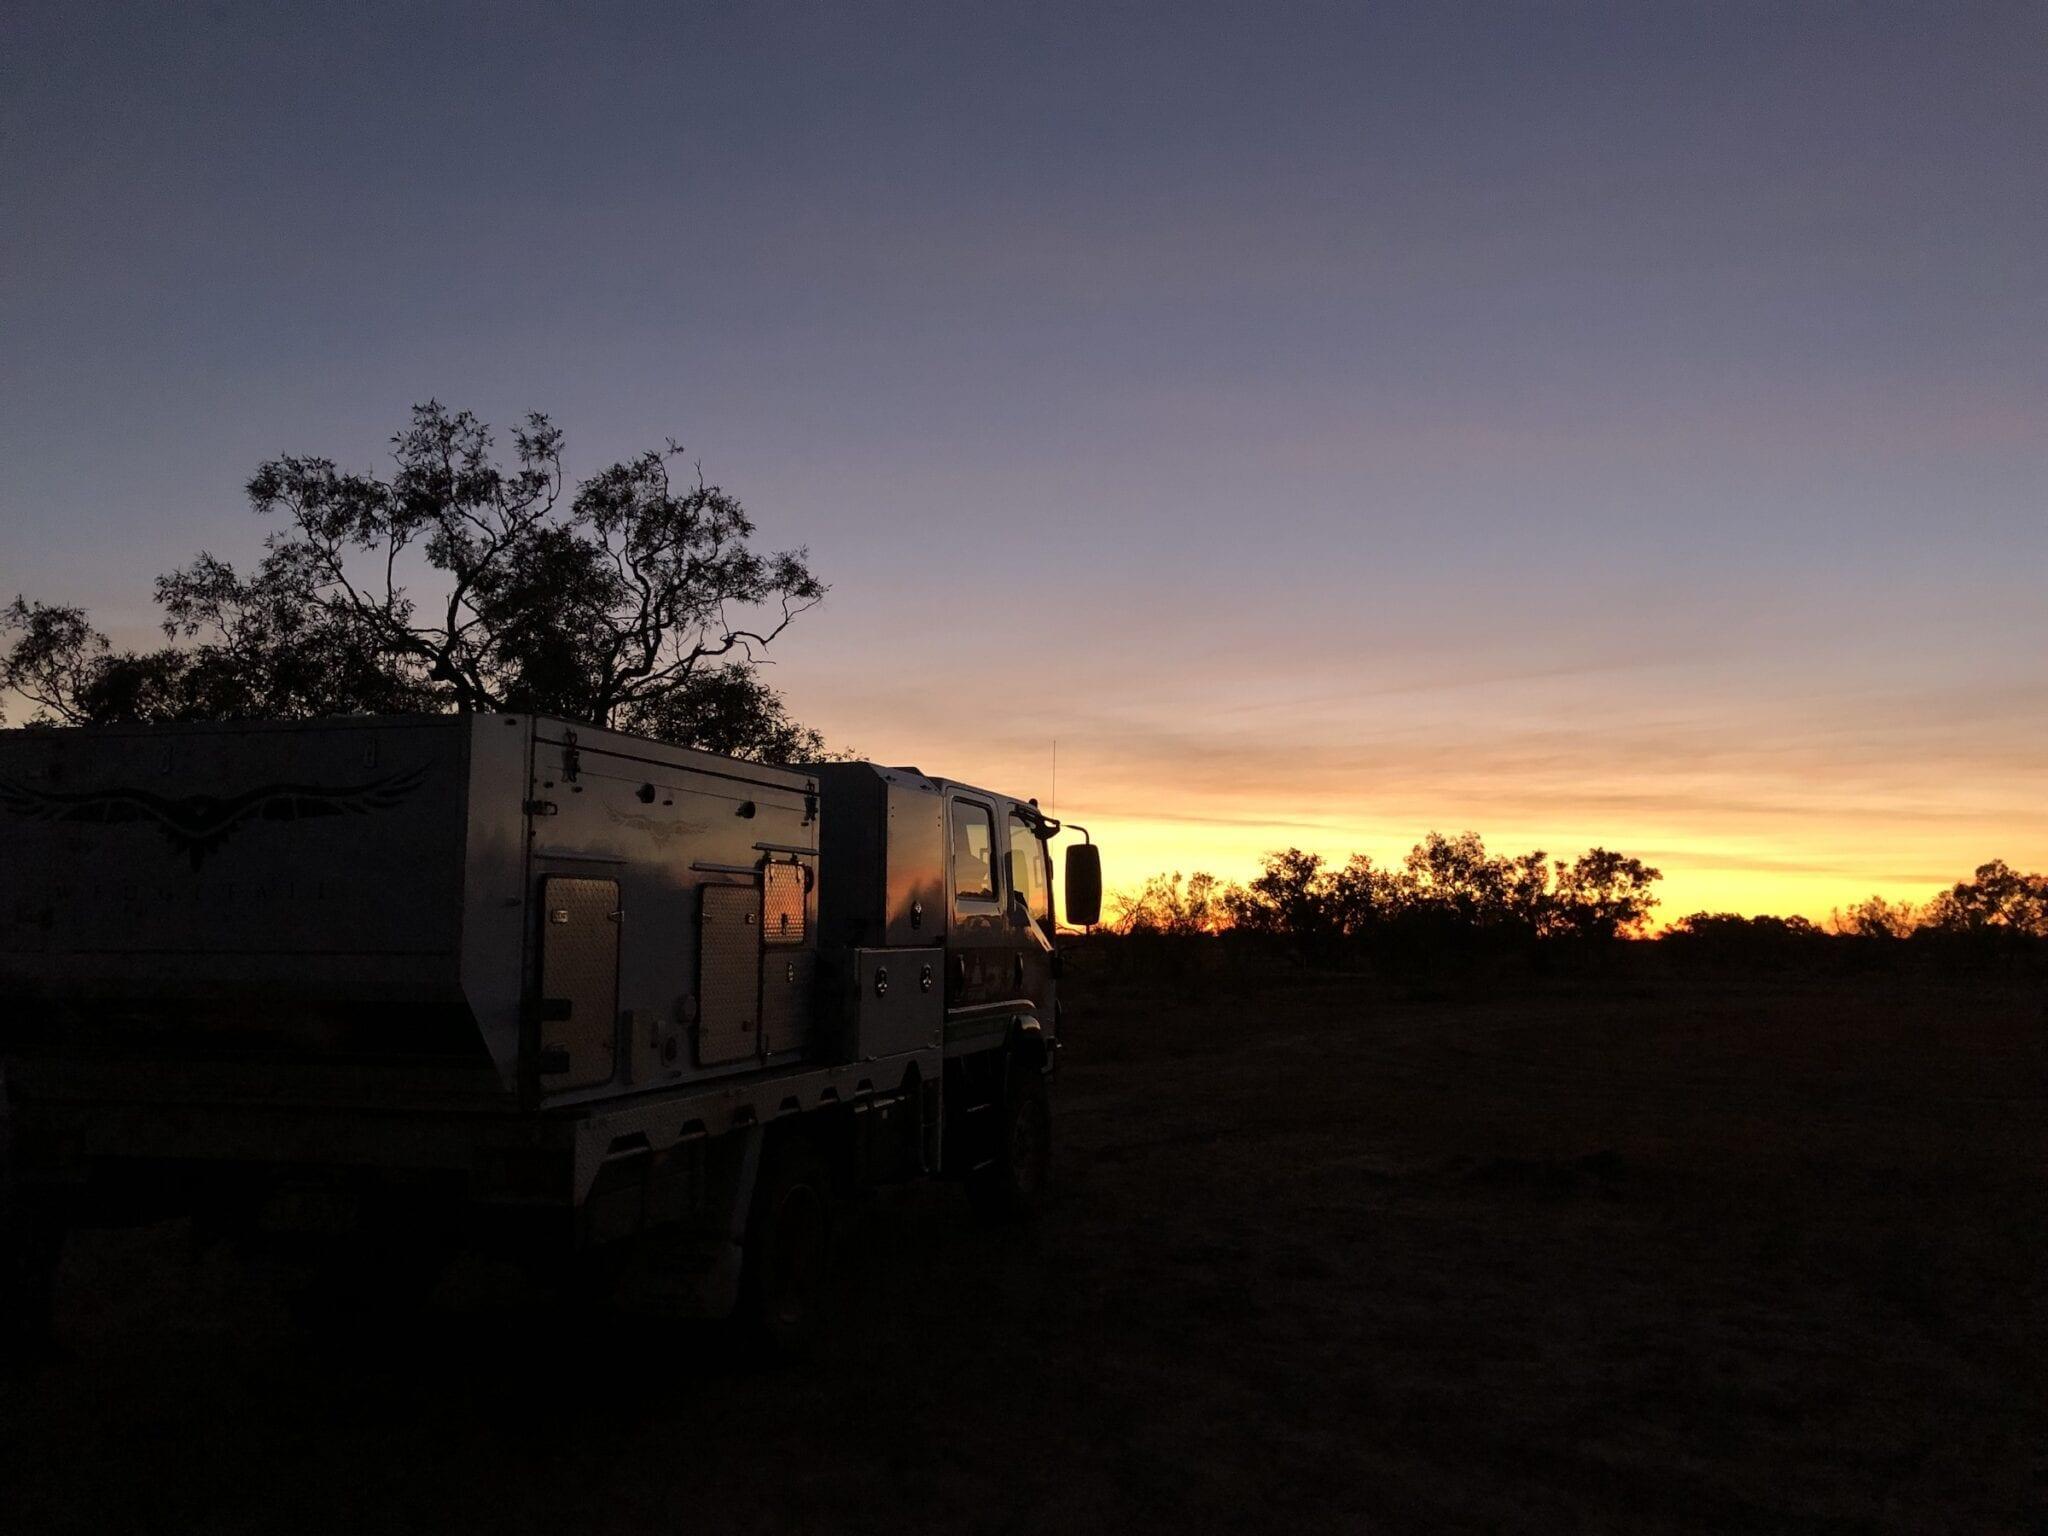 An inspiring sunrise in South_West Queensland. Long-term travel.